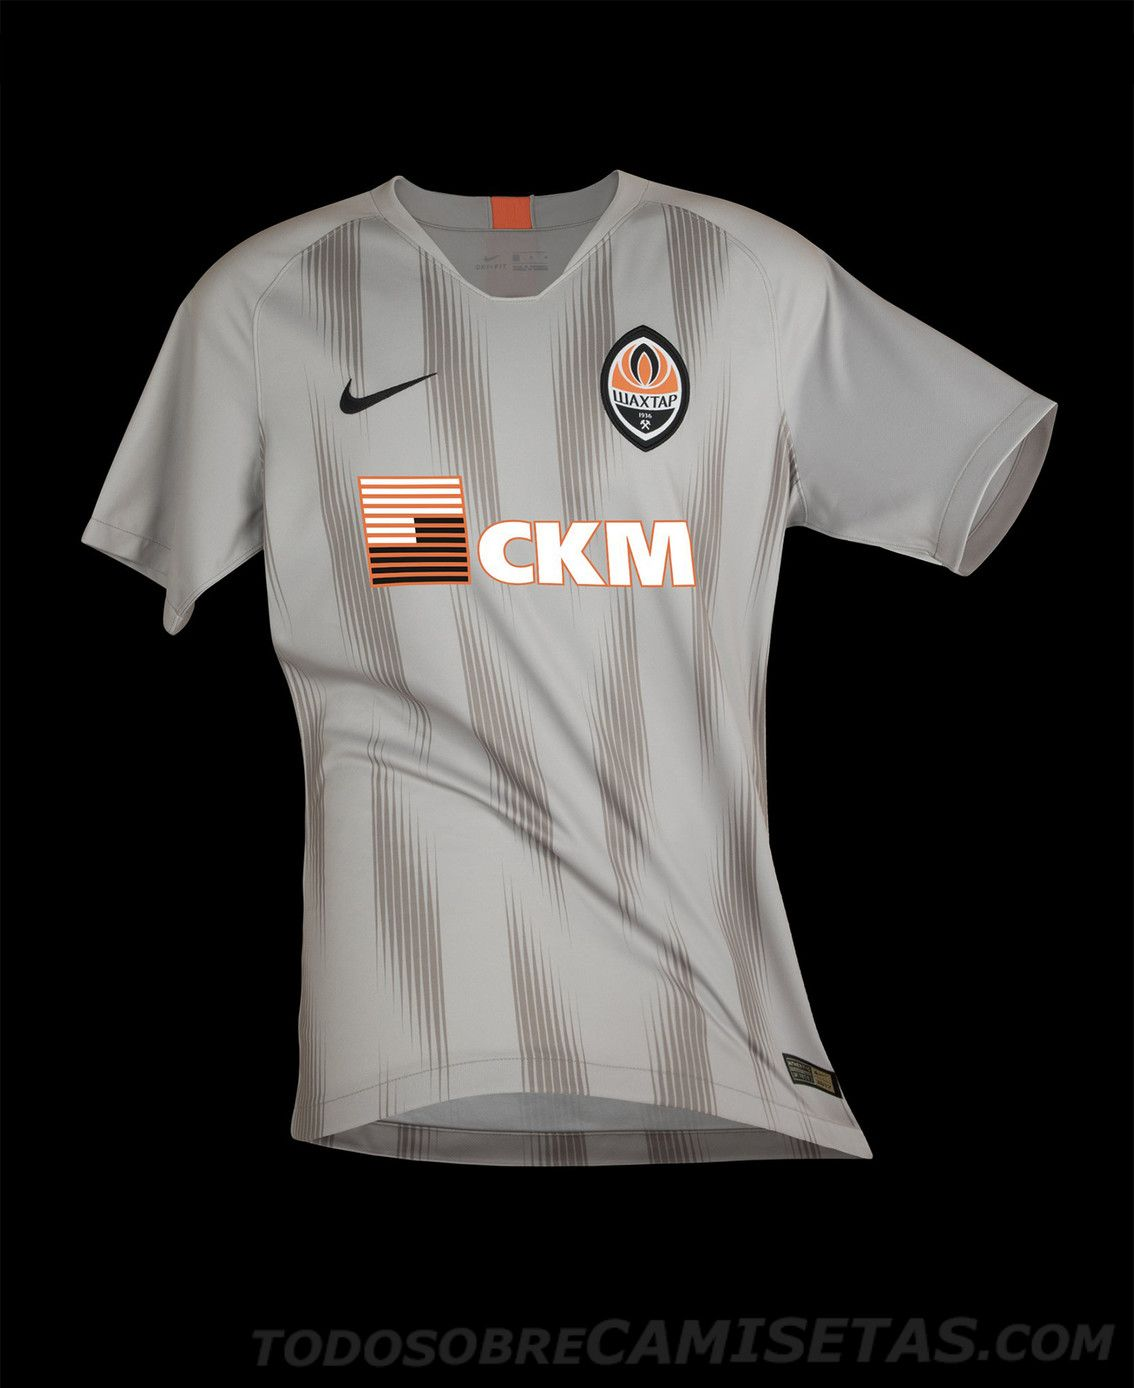 Shakhtar Donetsk Nike Away Kit 2018-19 Uniformes De Futbol a93cc393976